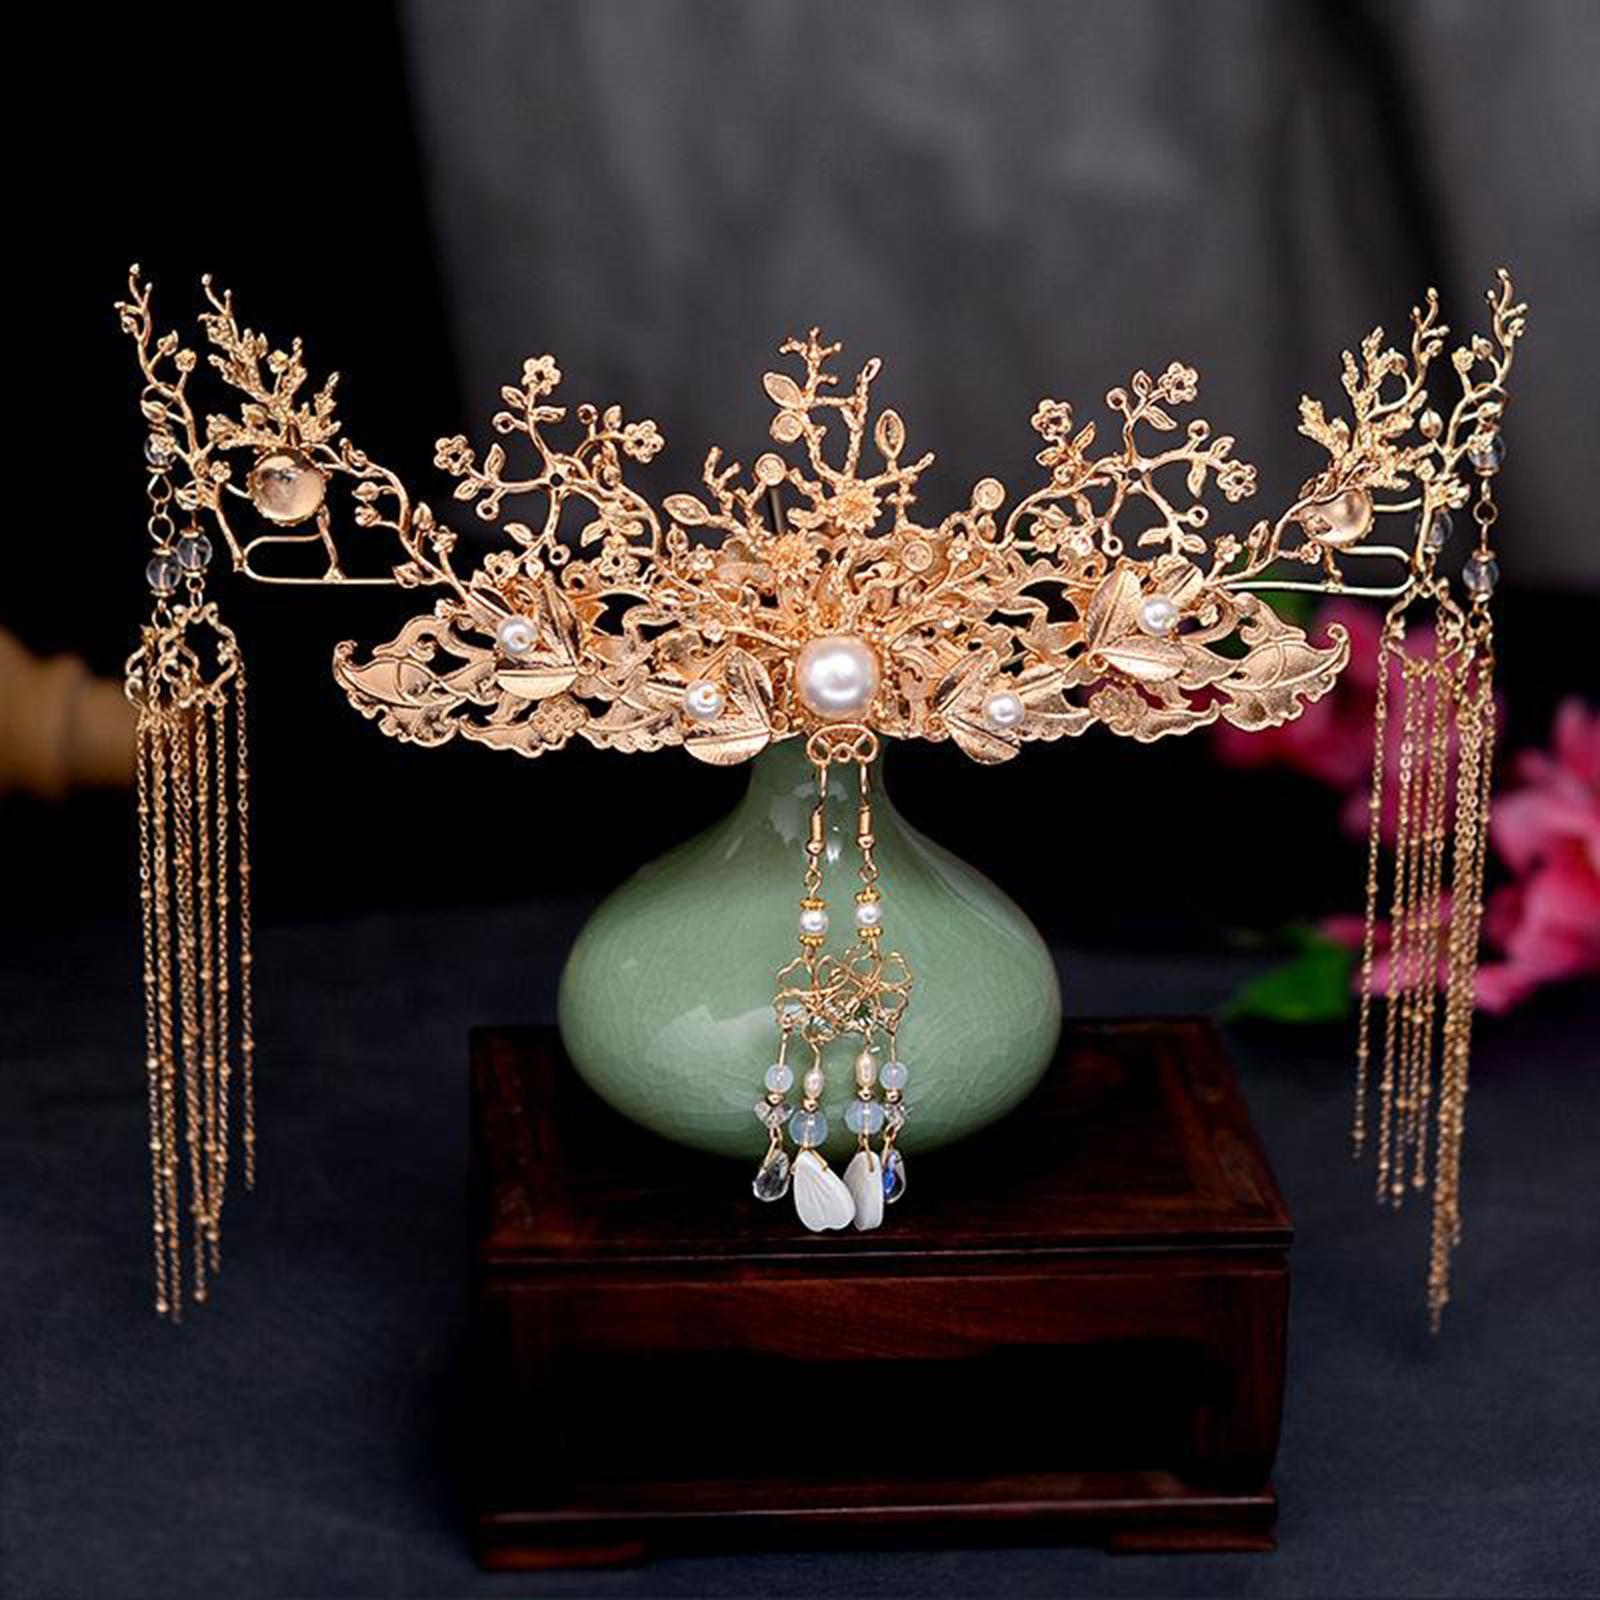 Chinese Hairpin Head Jewelry Wedding Headdress Accessories Long Tassels